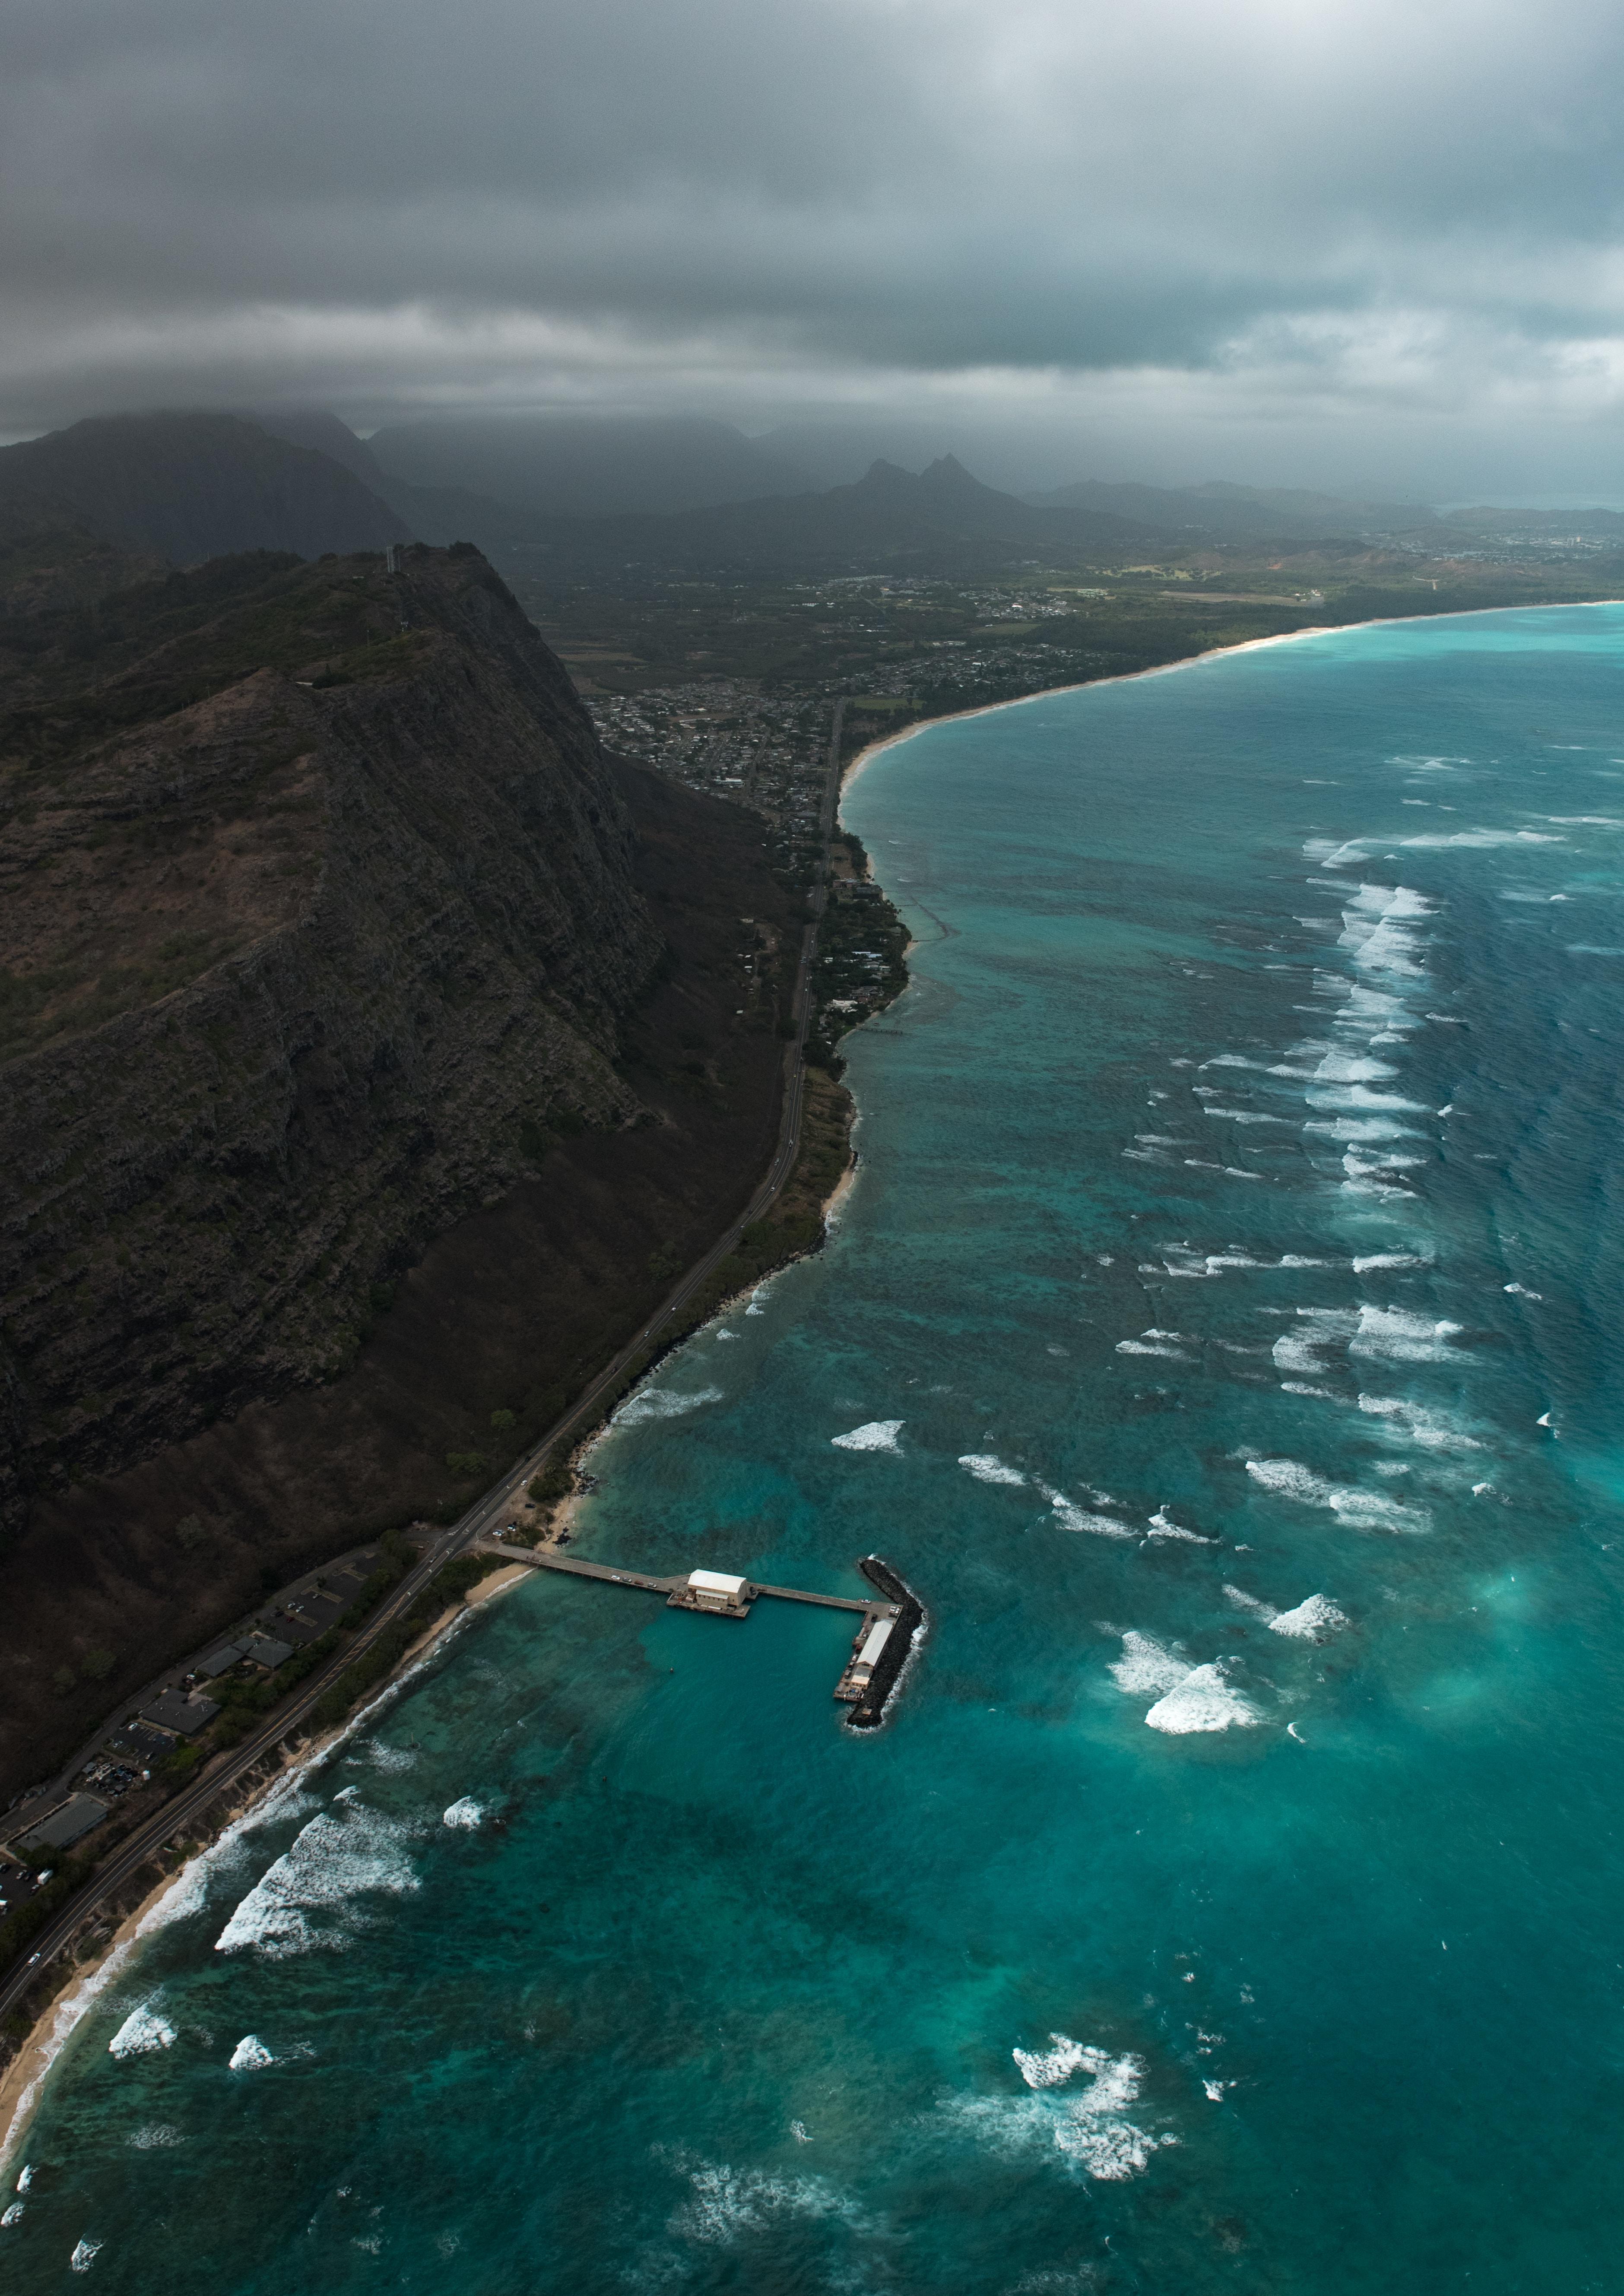 aerial photo of beach dock near cliff